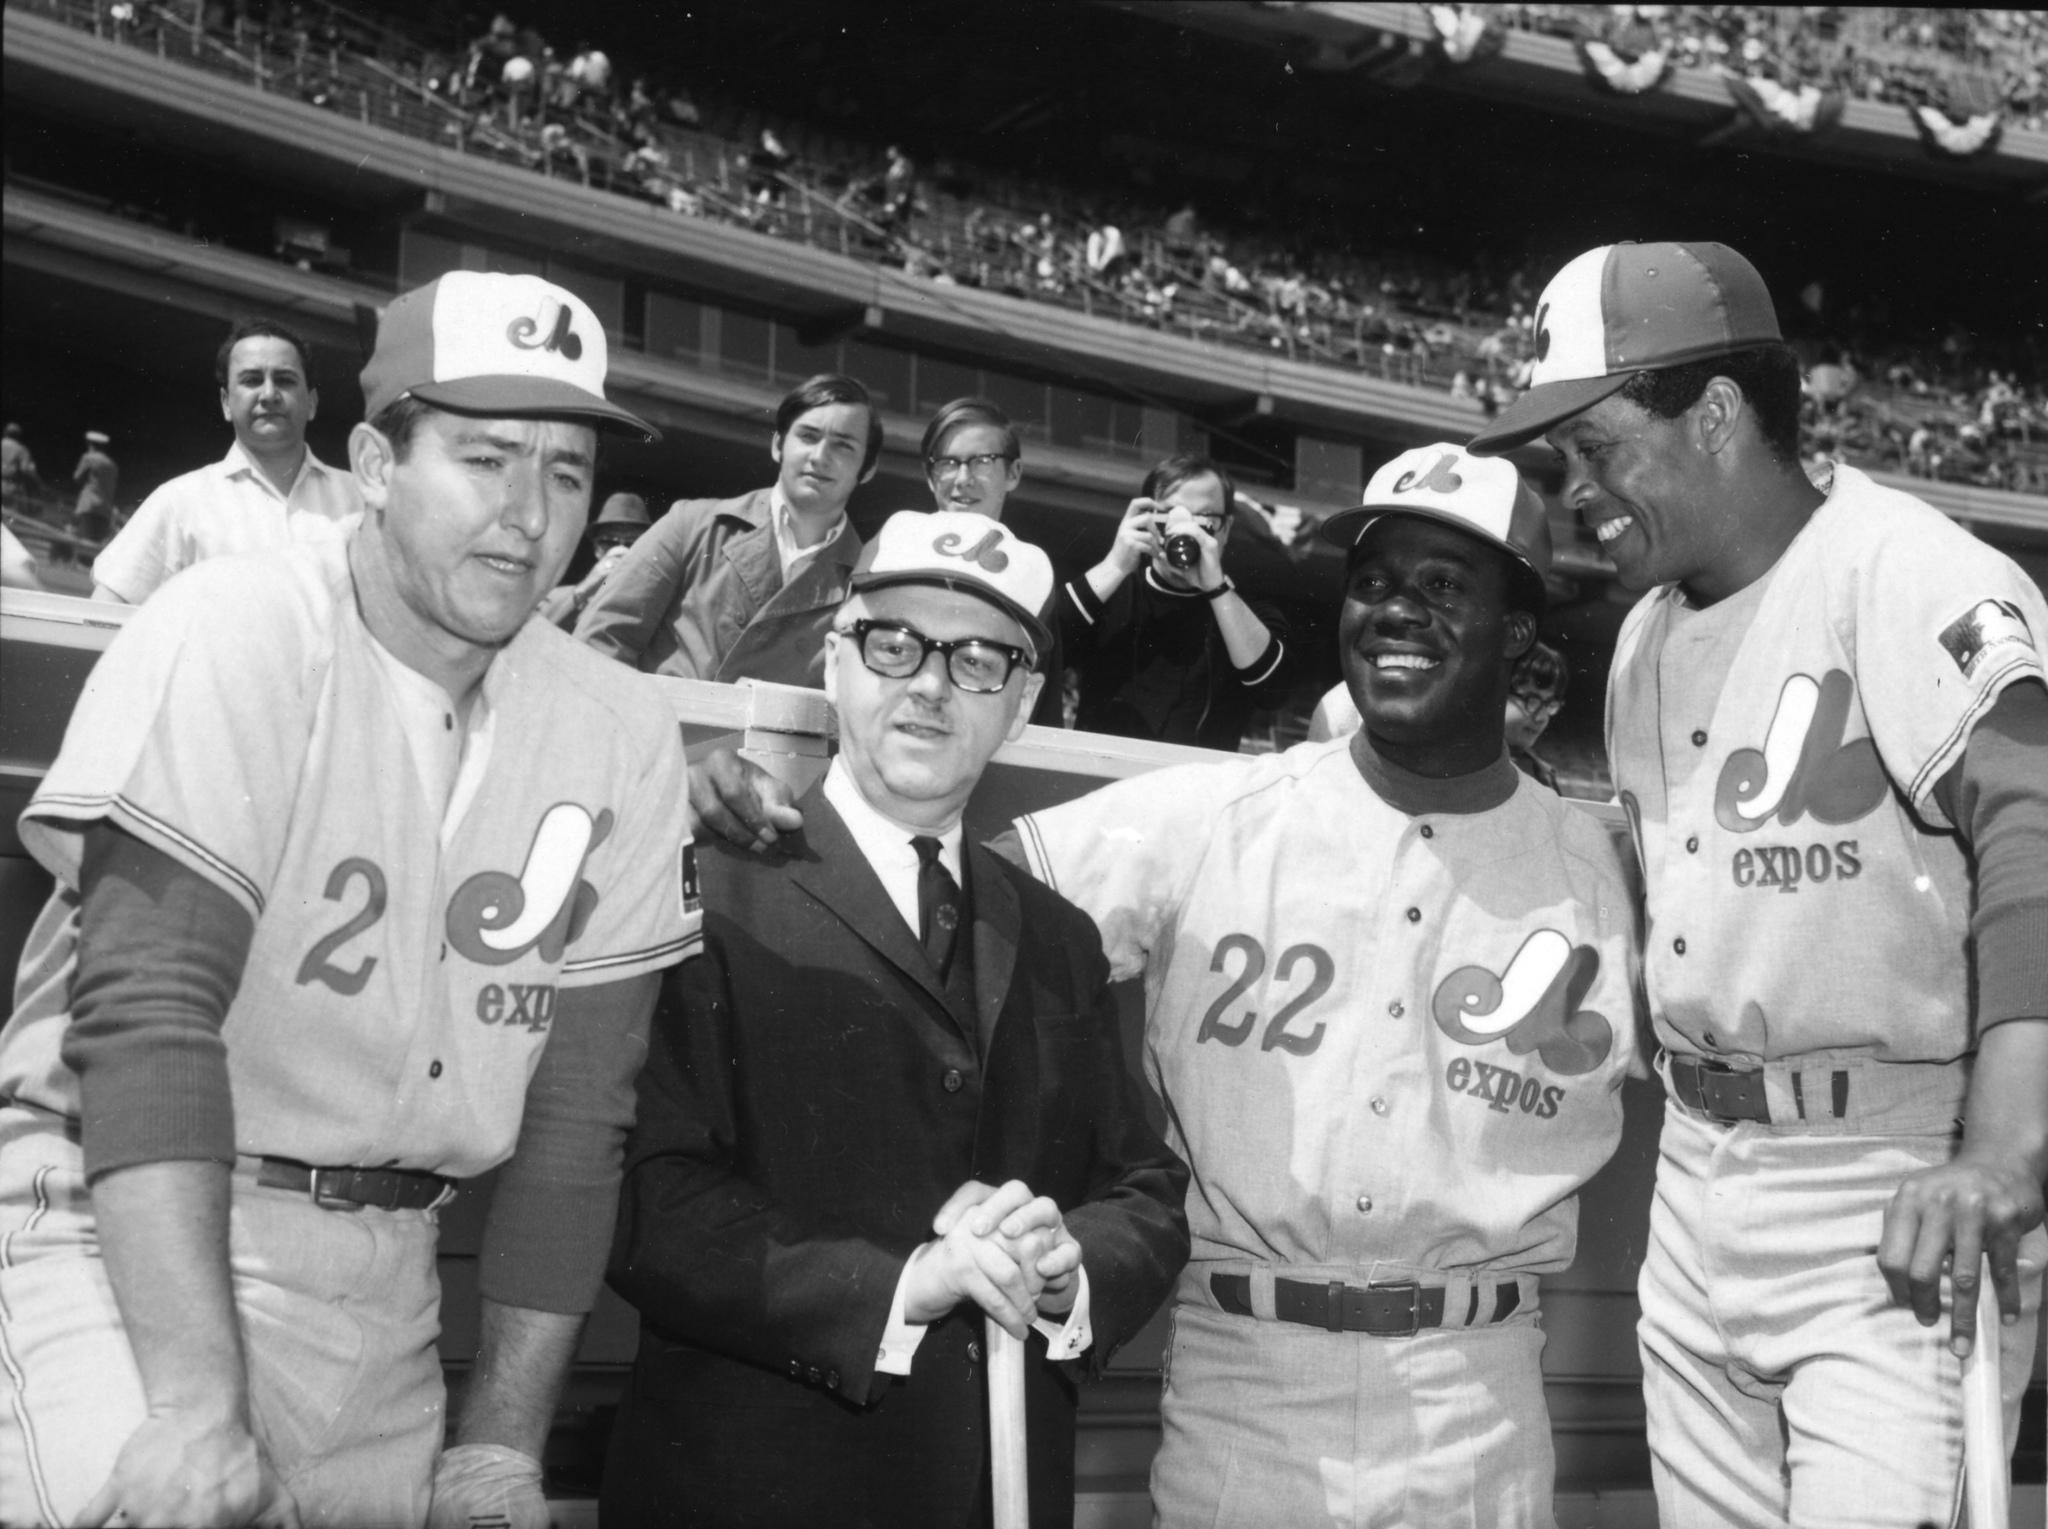 1969 Montreal Expos opener